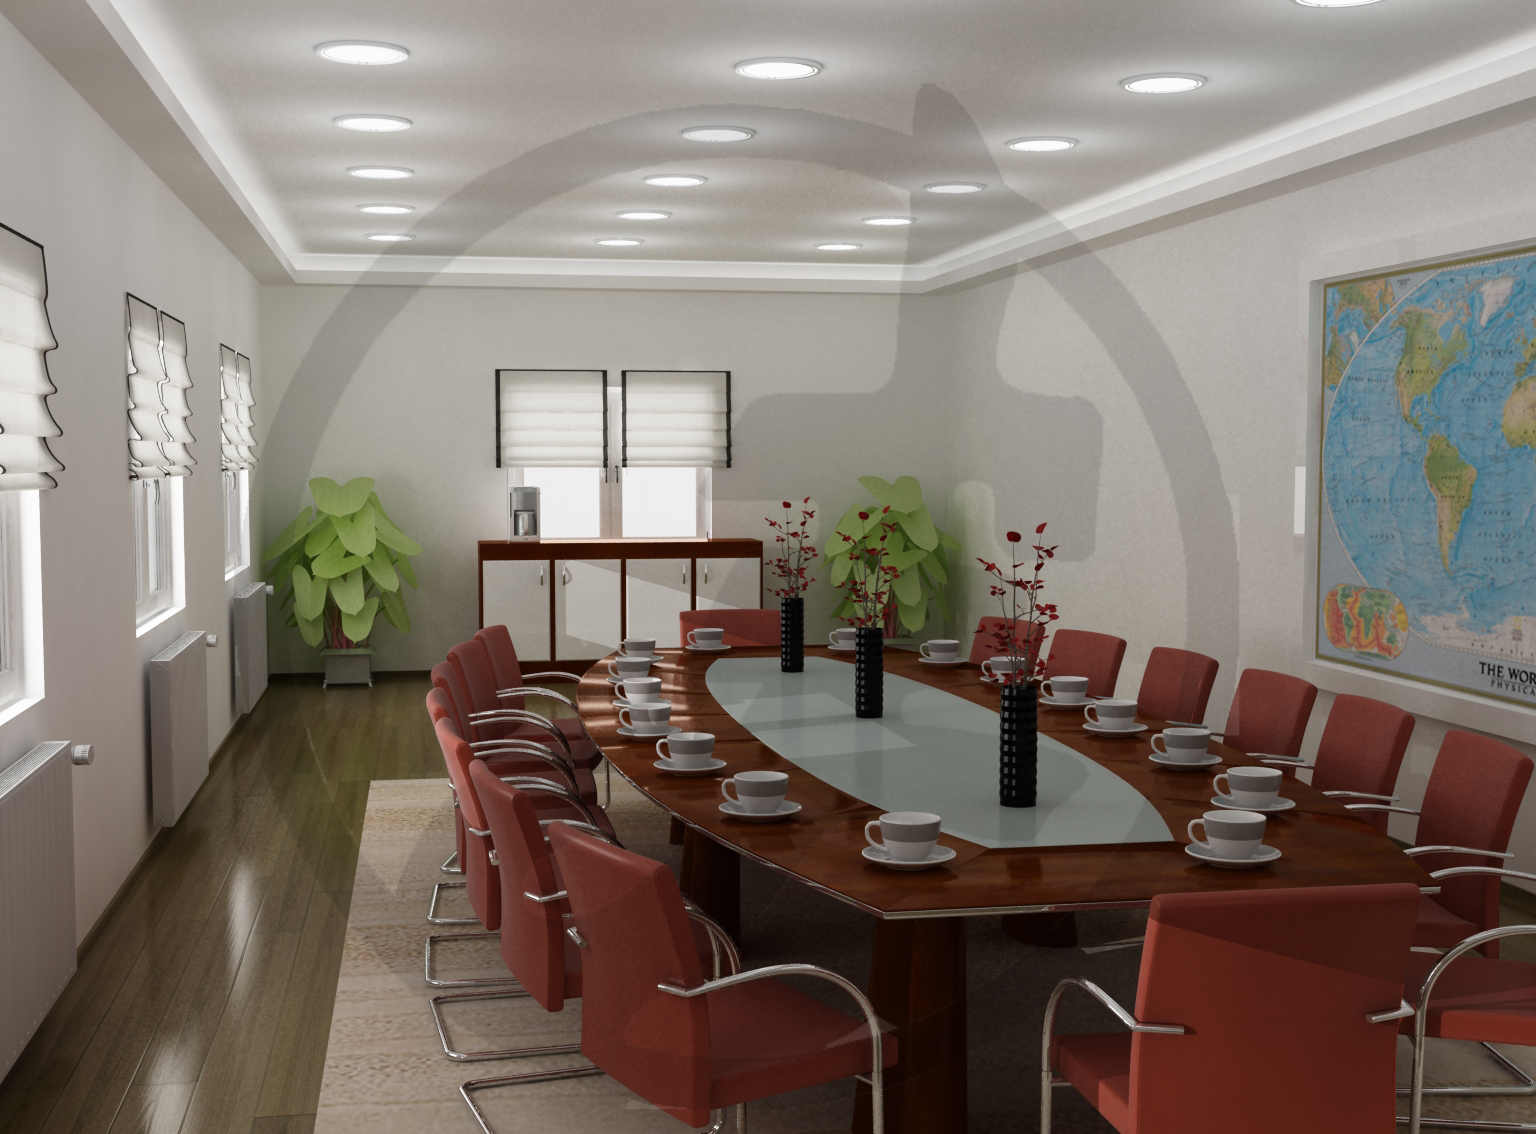 Nevpa t�caret toplant� salonu